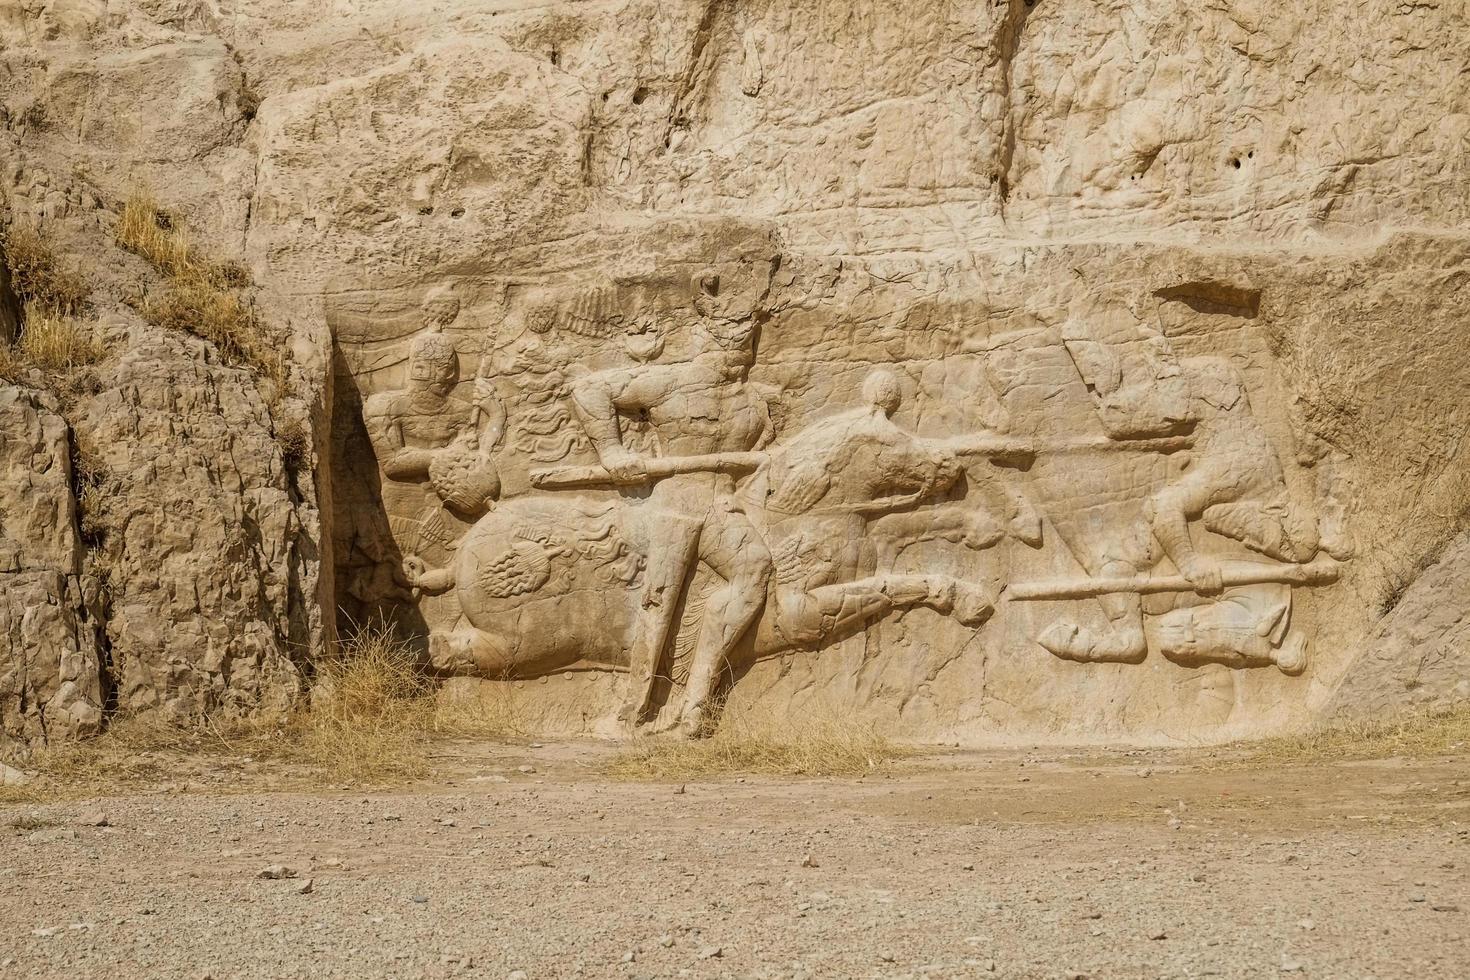 sassanidengesteente reliëf in naqsh-e rostam, iran foto